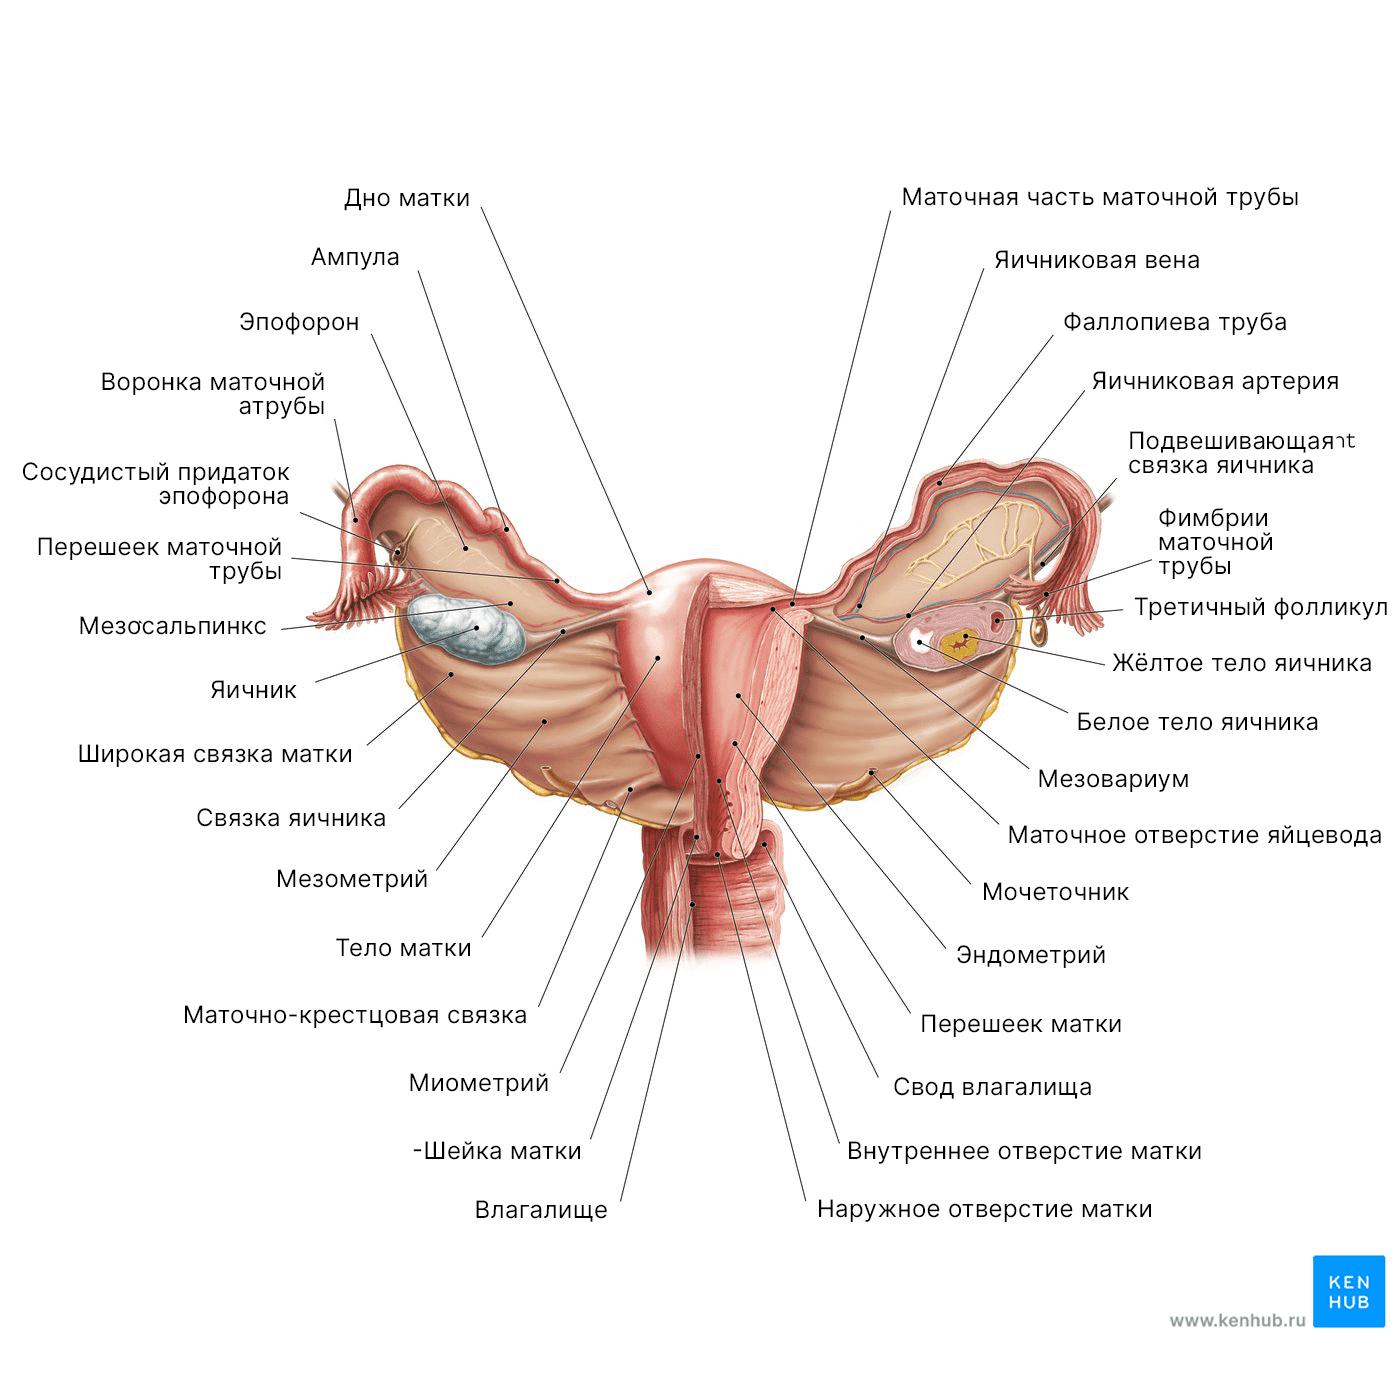 Схема женской анатомии: Матка и яичники